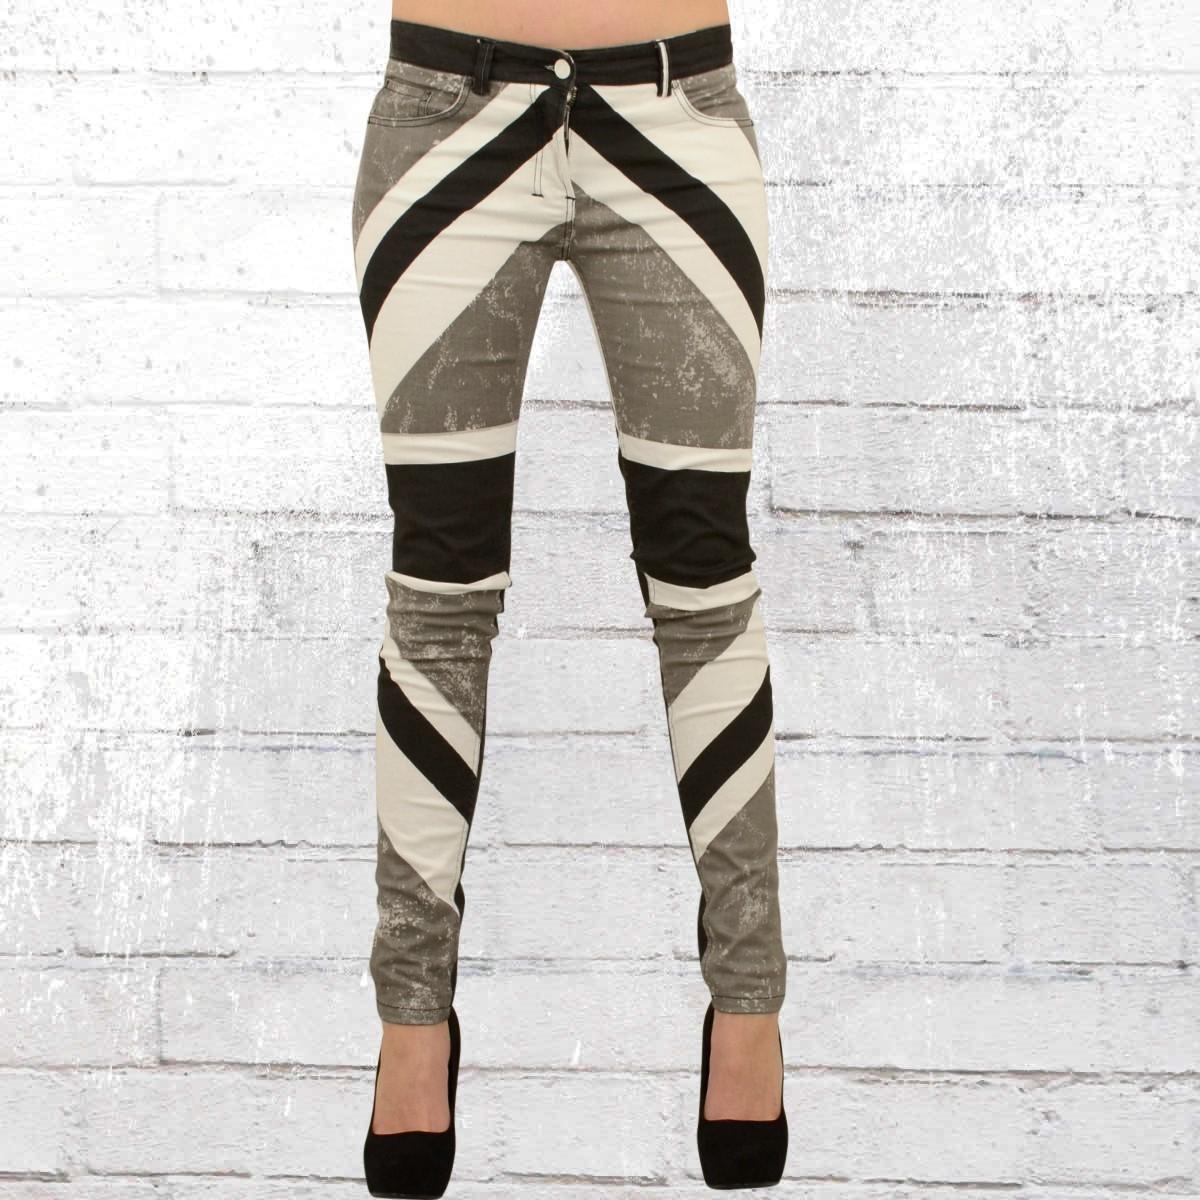 d34e6bbb8fb9 Religion Damen Skinny Jeans Hose Union Jack schwarz grau weiss